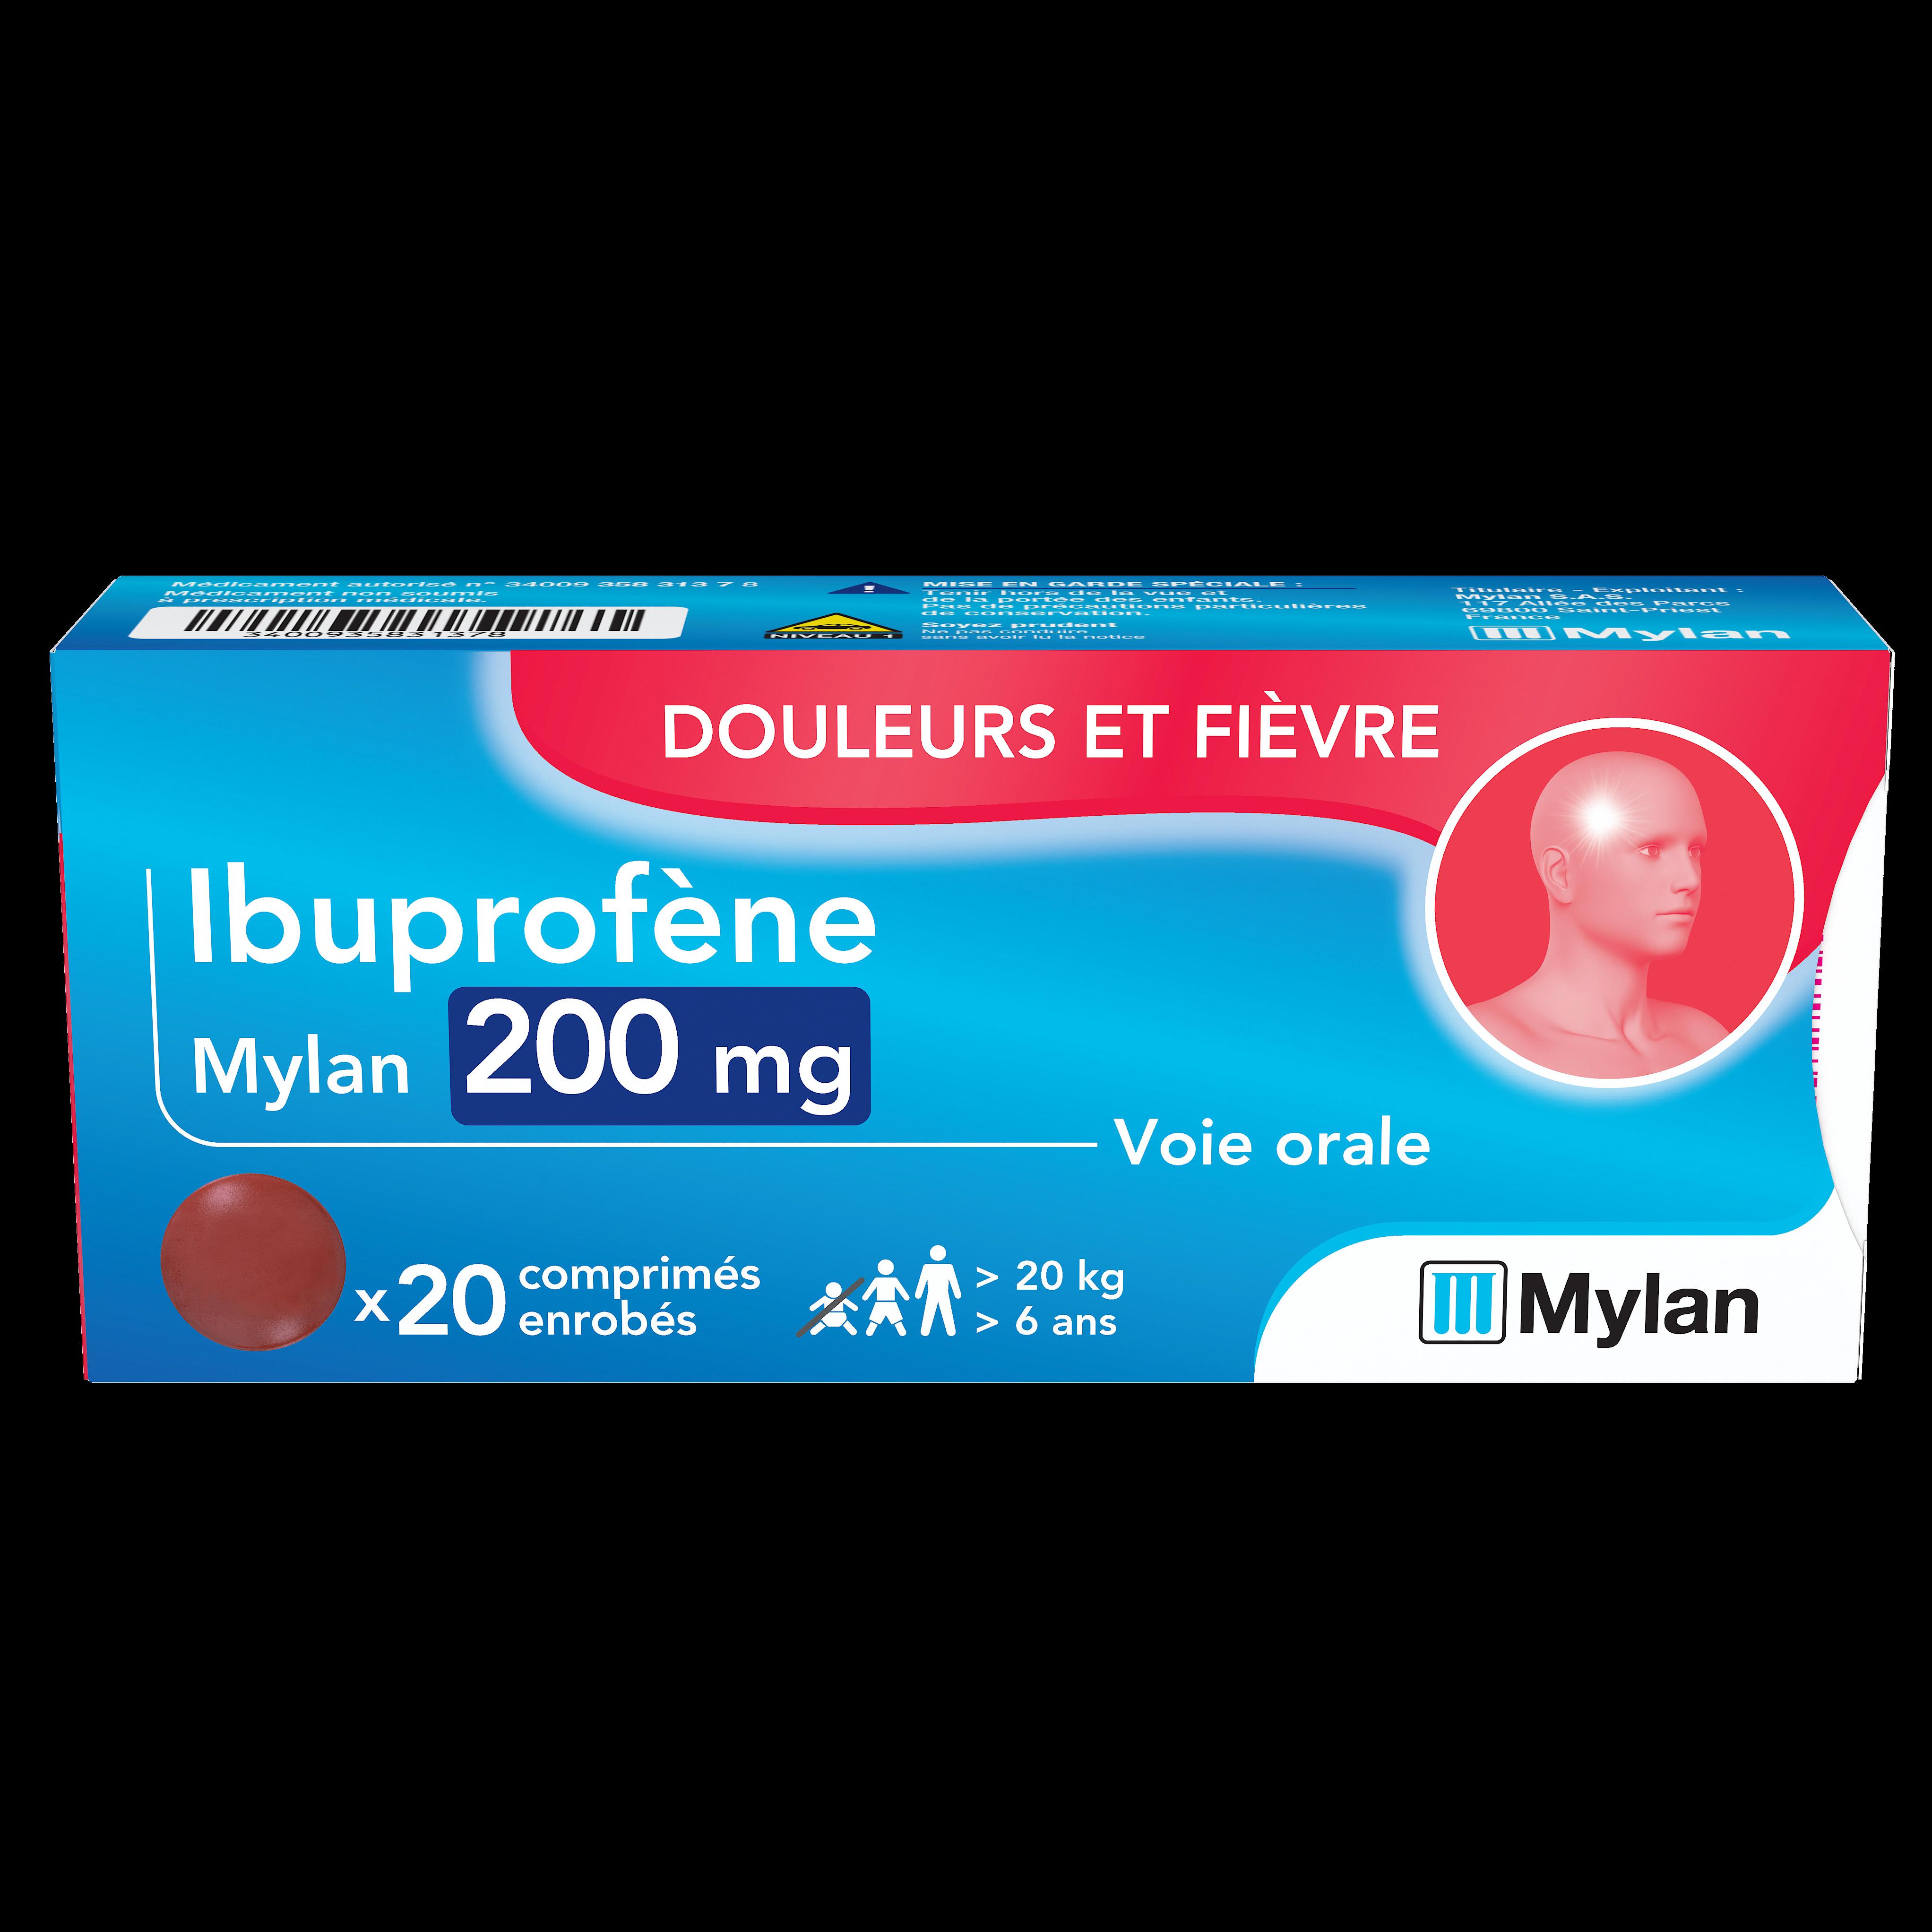 Ibuprofene 200 Mg 20 Comprimes